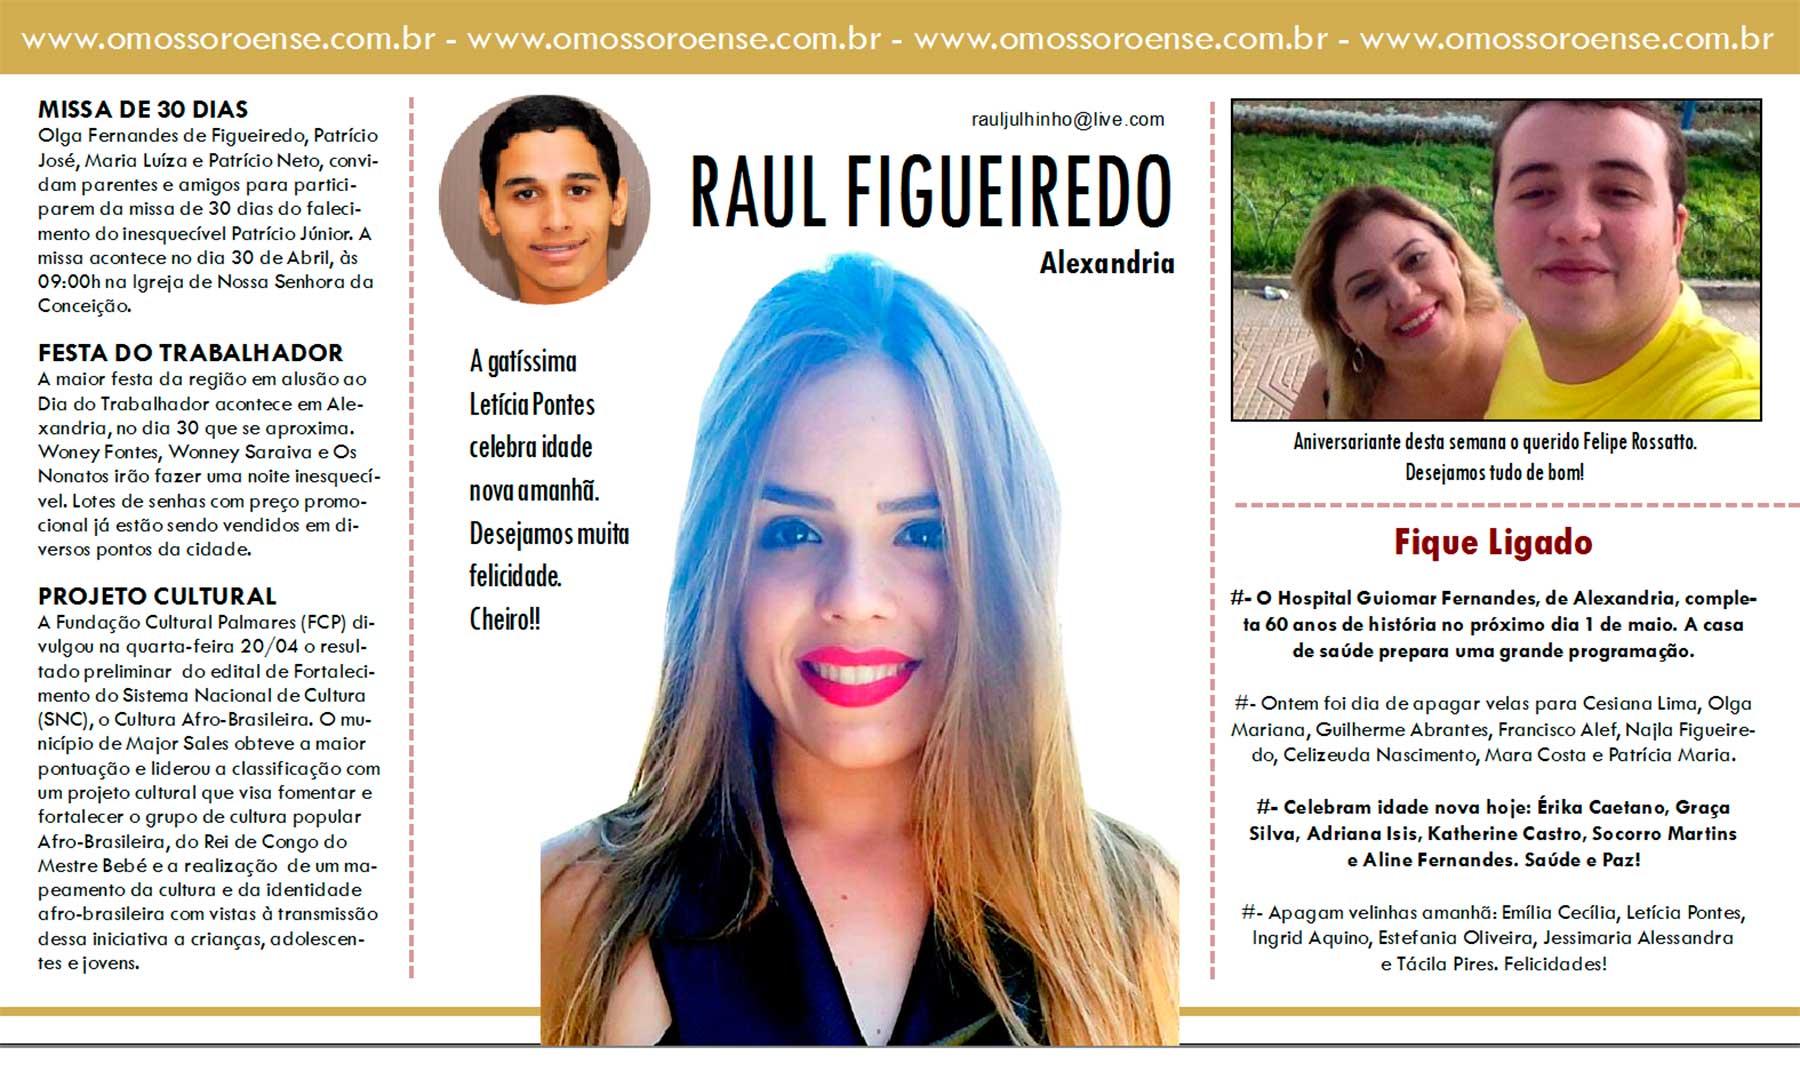 RAUL-FIGUEIREDO---26-04-2016